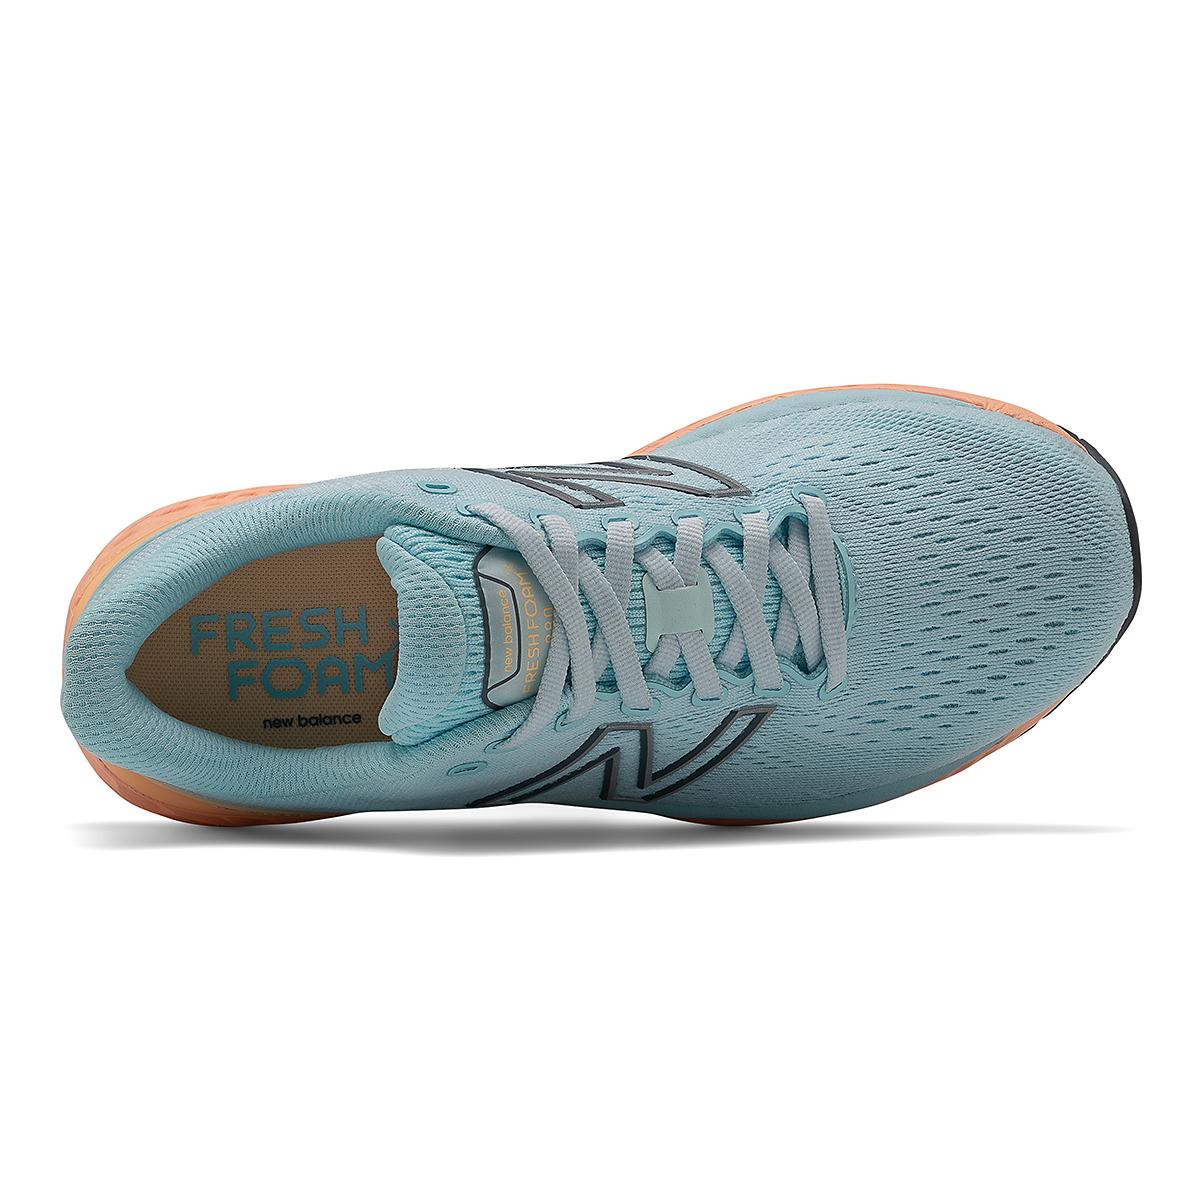 Women's New Balance 880V11 Running Shoe - Color: Pale Blue Chill/Light Mango - Size: 5 - Width: Narrow, Pale Blue Chill/Light Mango, large, image 4